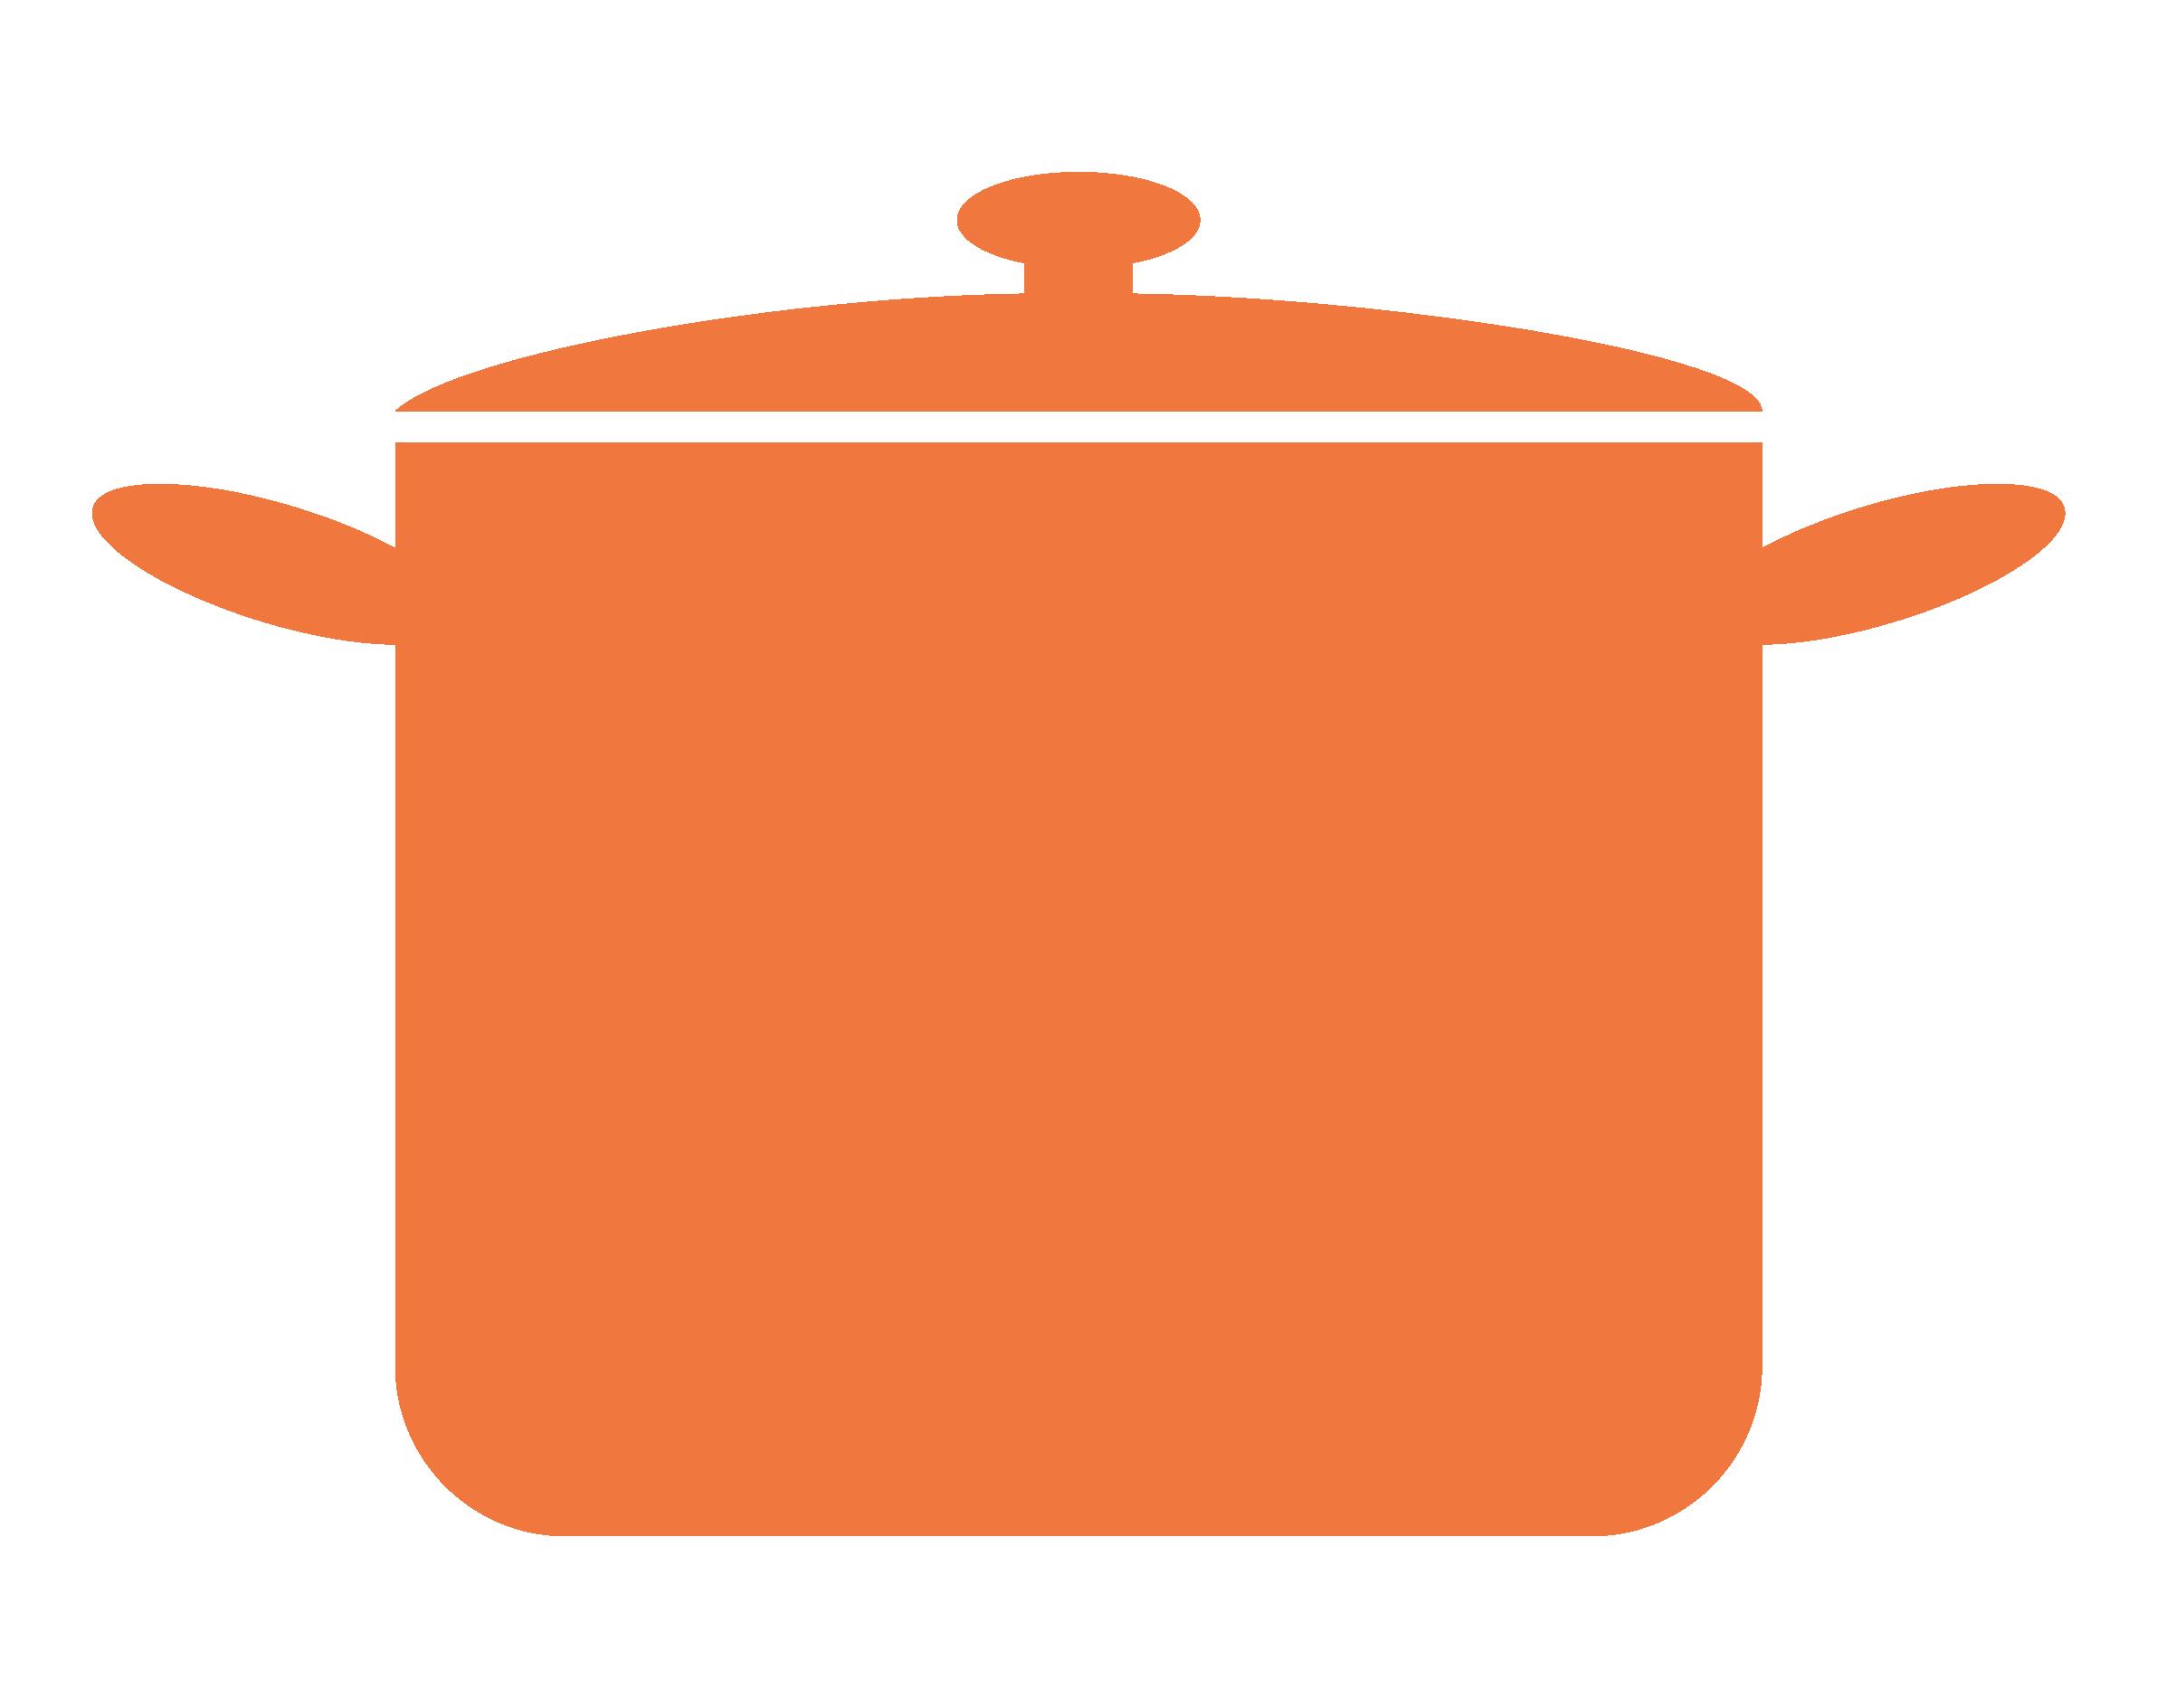 Kitchen Utensils Clip Art Pan-Kitchen Utensils Clip Art Pan-15